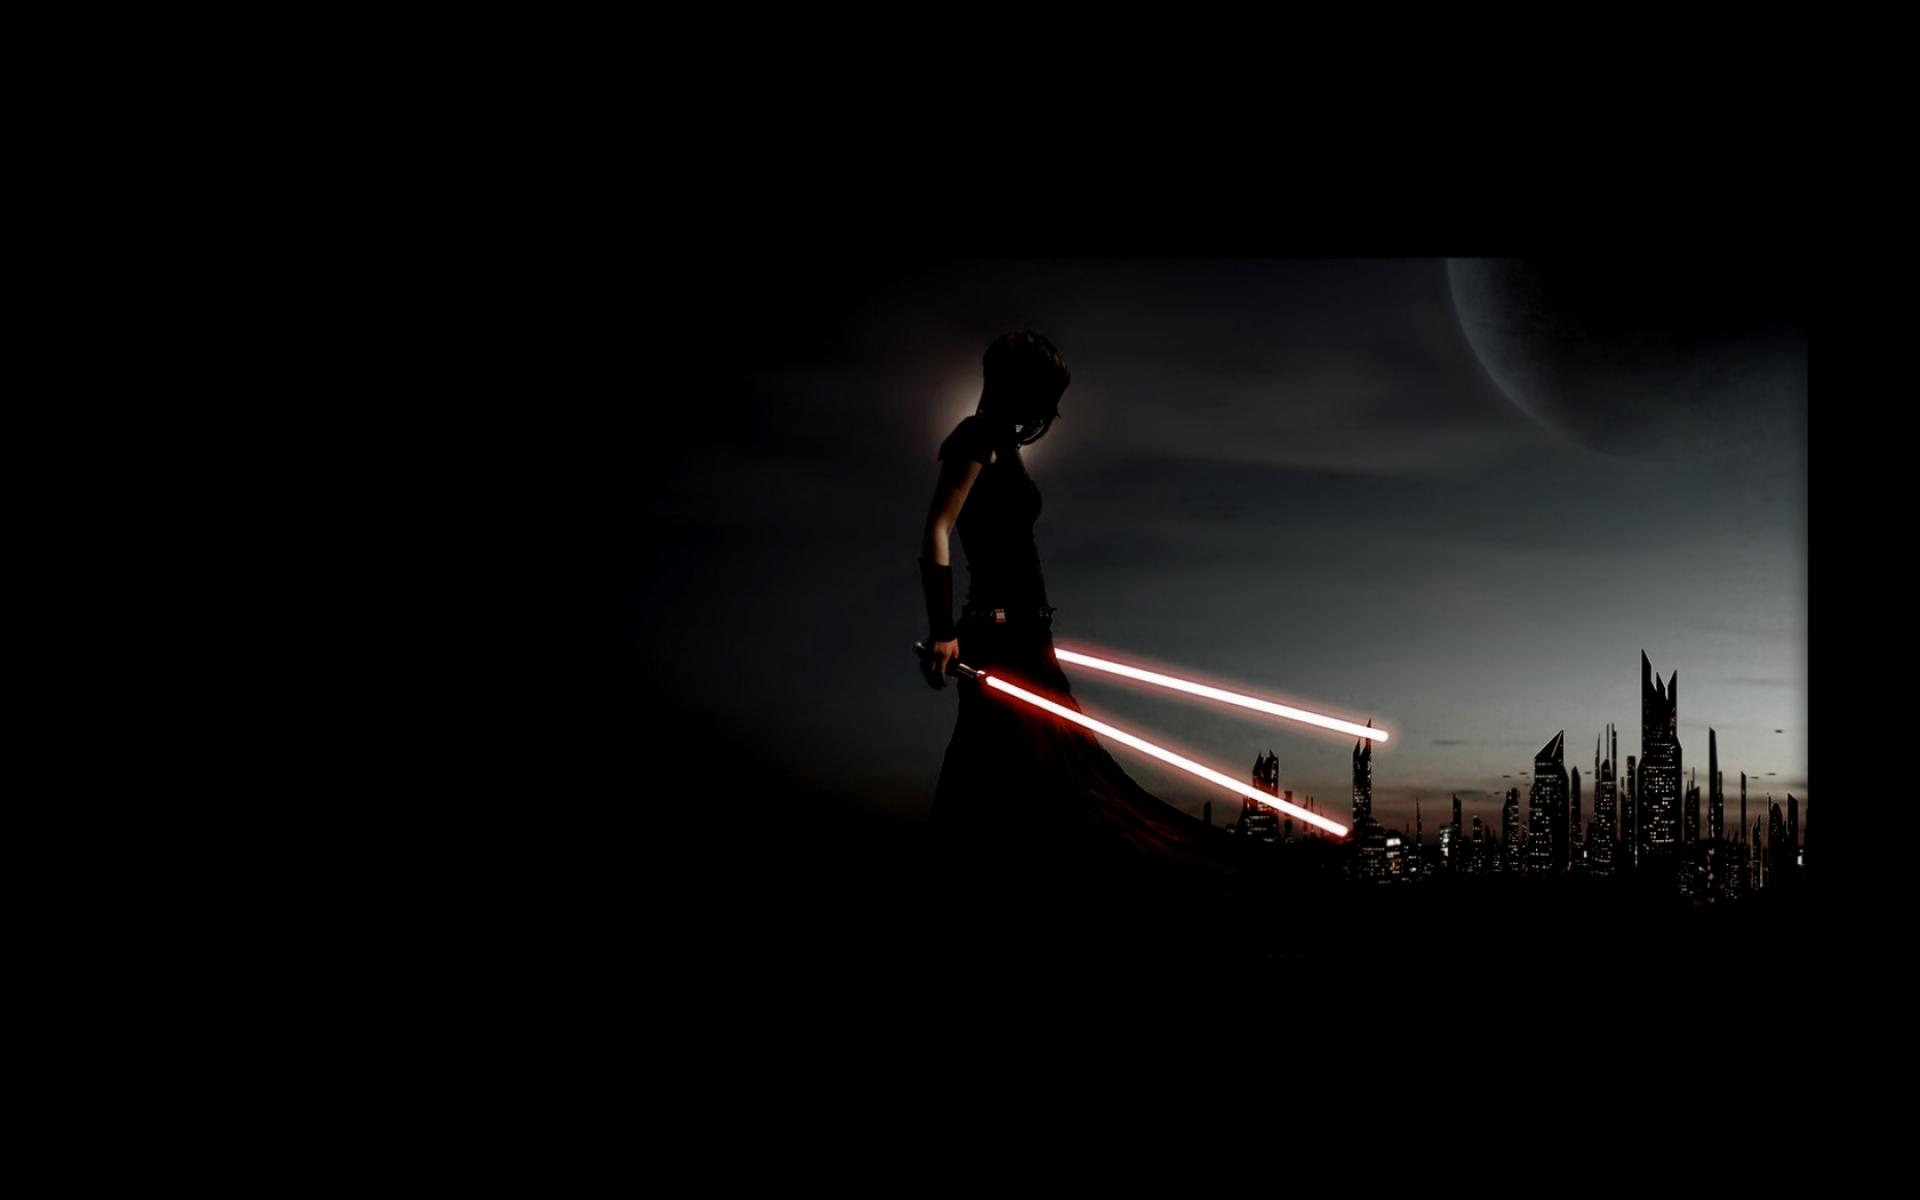 star wars lightsabers sith warriors 1680x1050 wallpaper Art HD 1920x1200